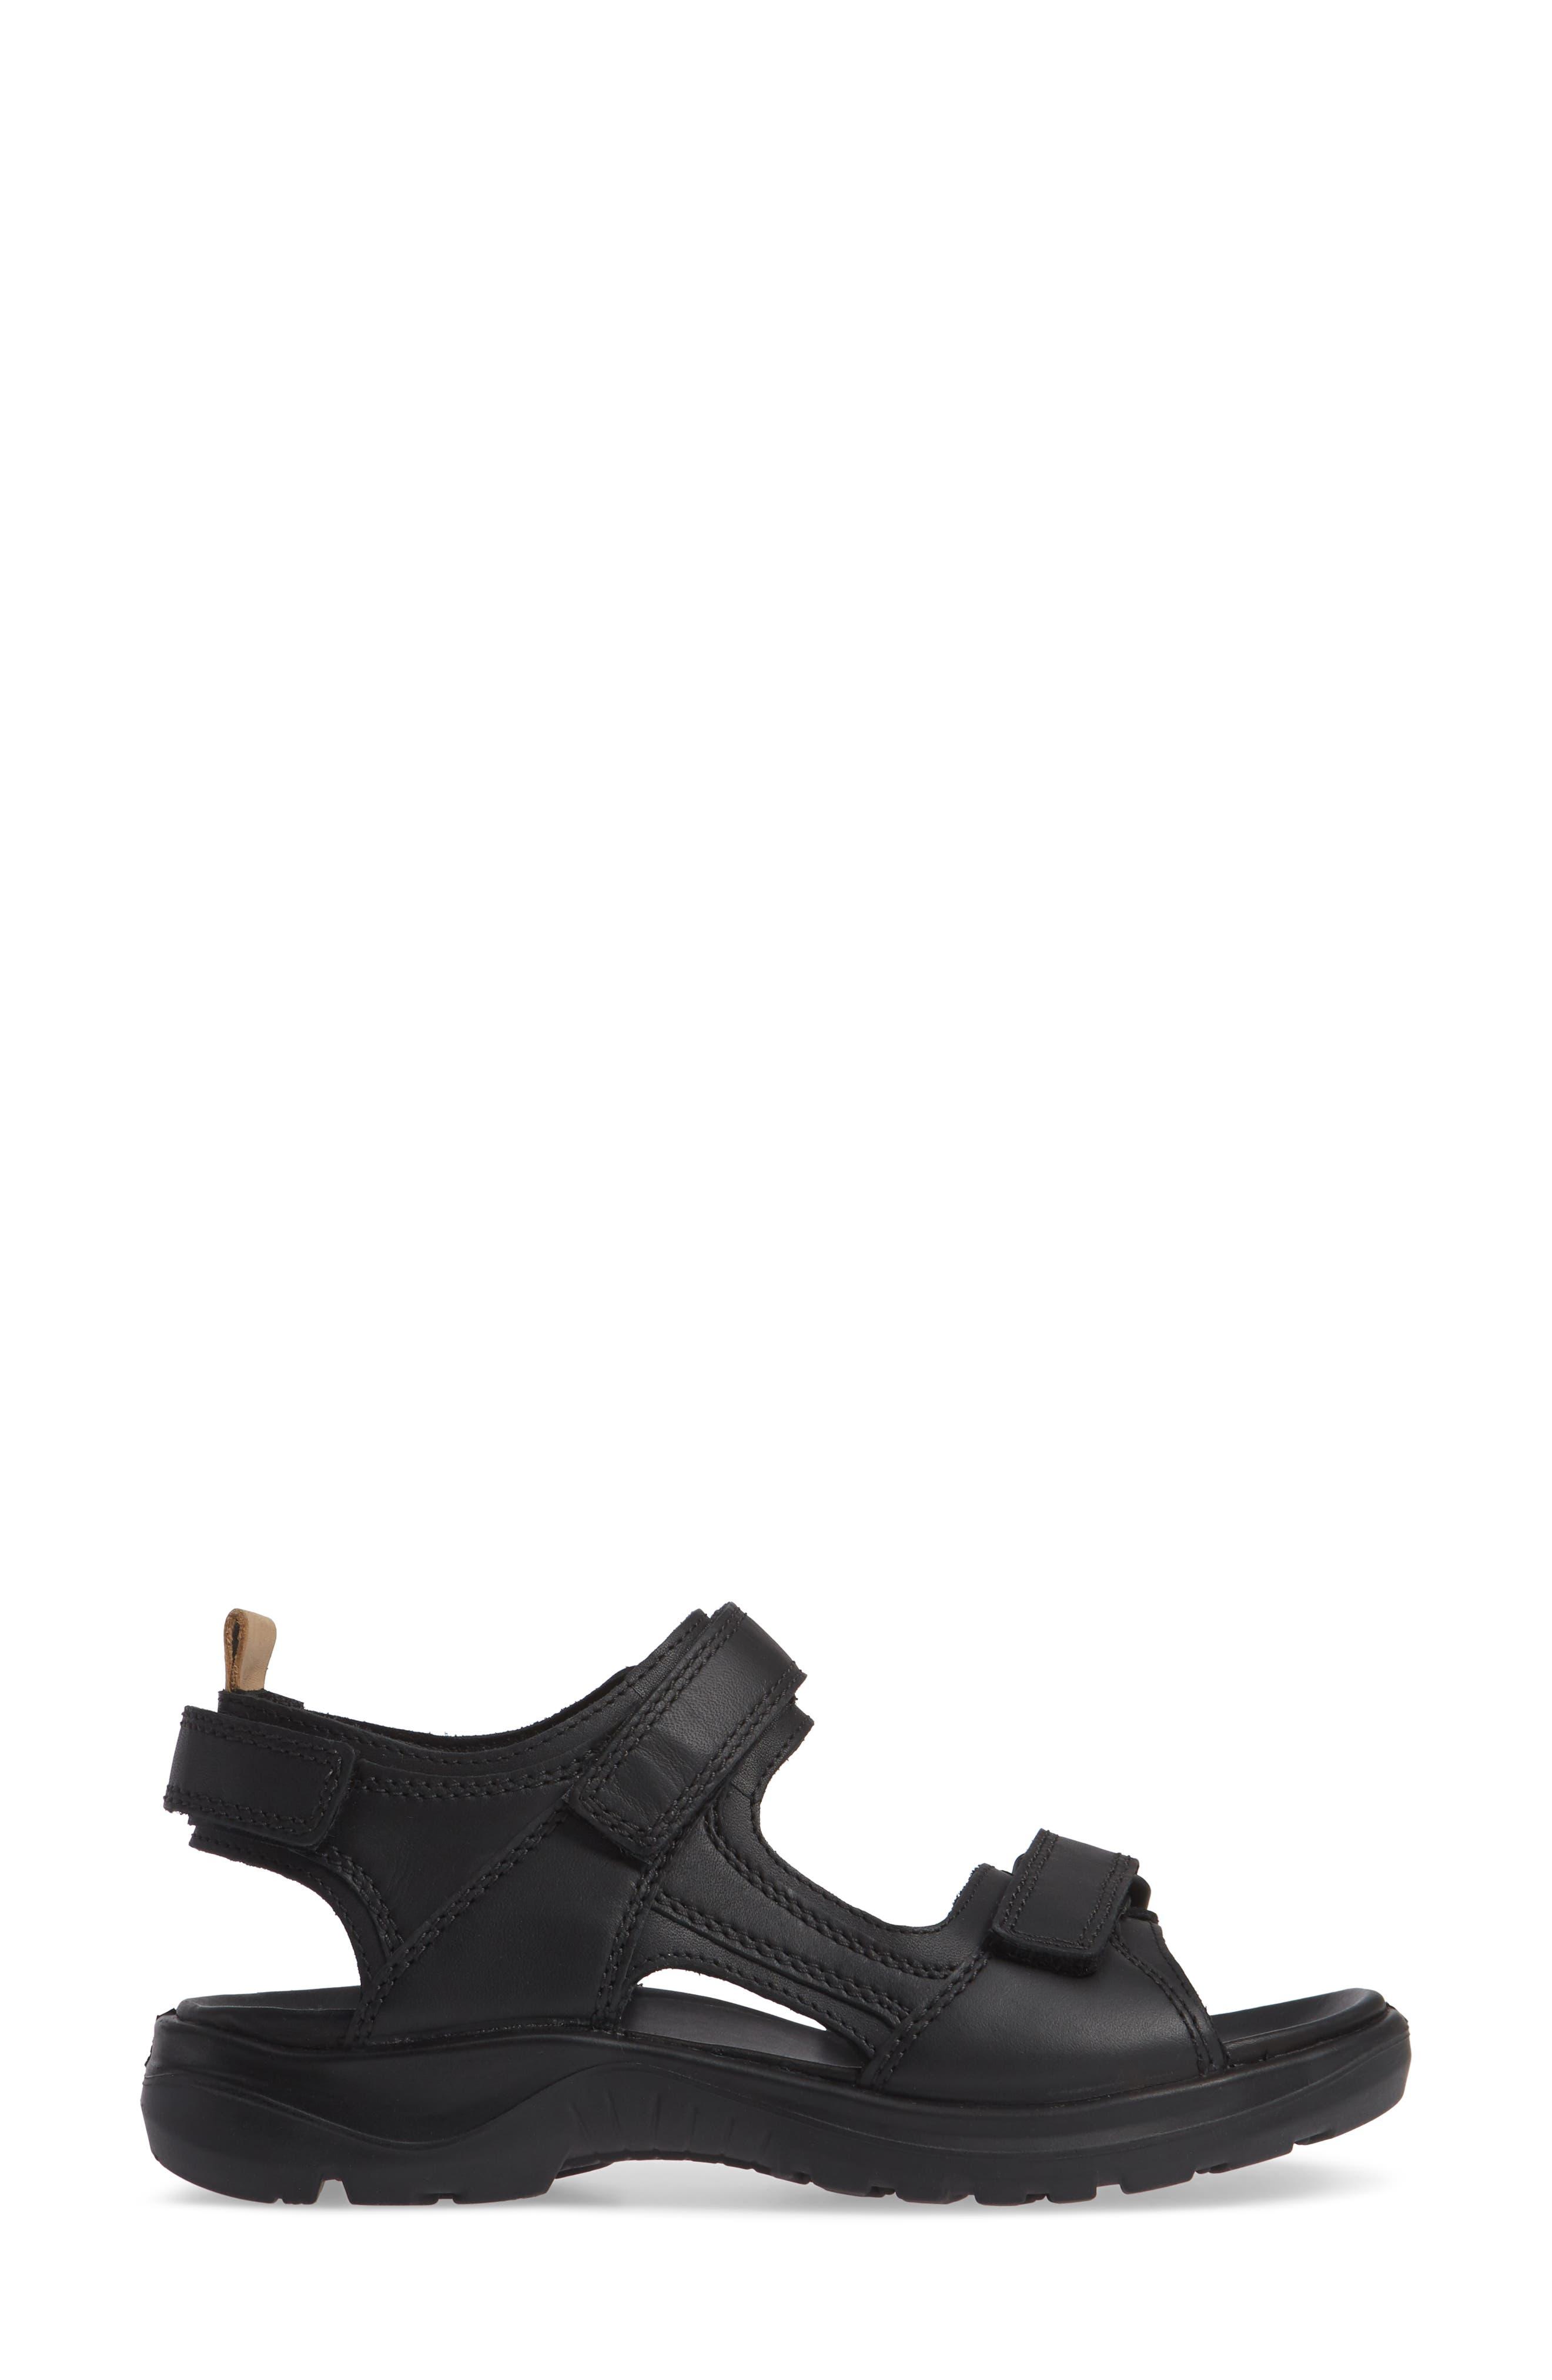 Premium Offroad Sandal,                             Alternate thumbnail 3, color,                             BLACK NUBUCK LEATHER